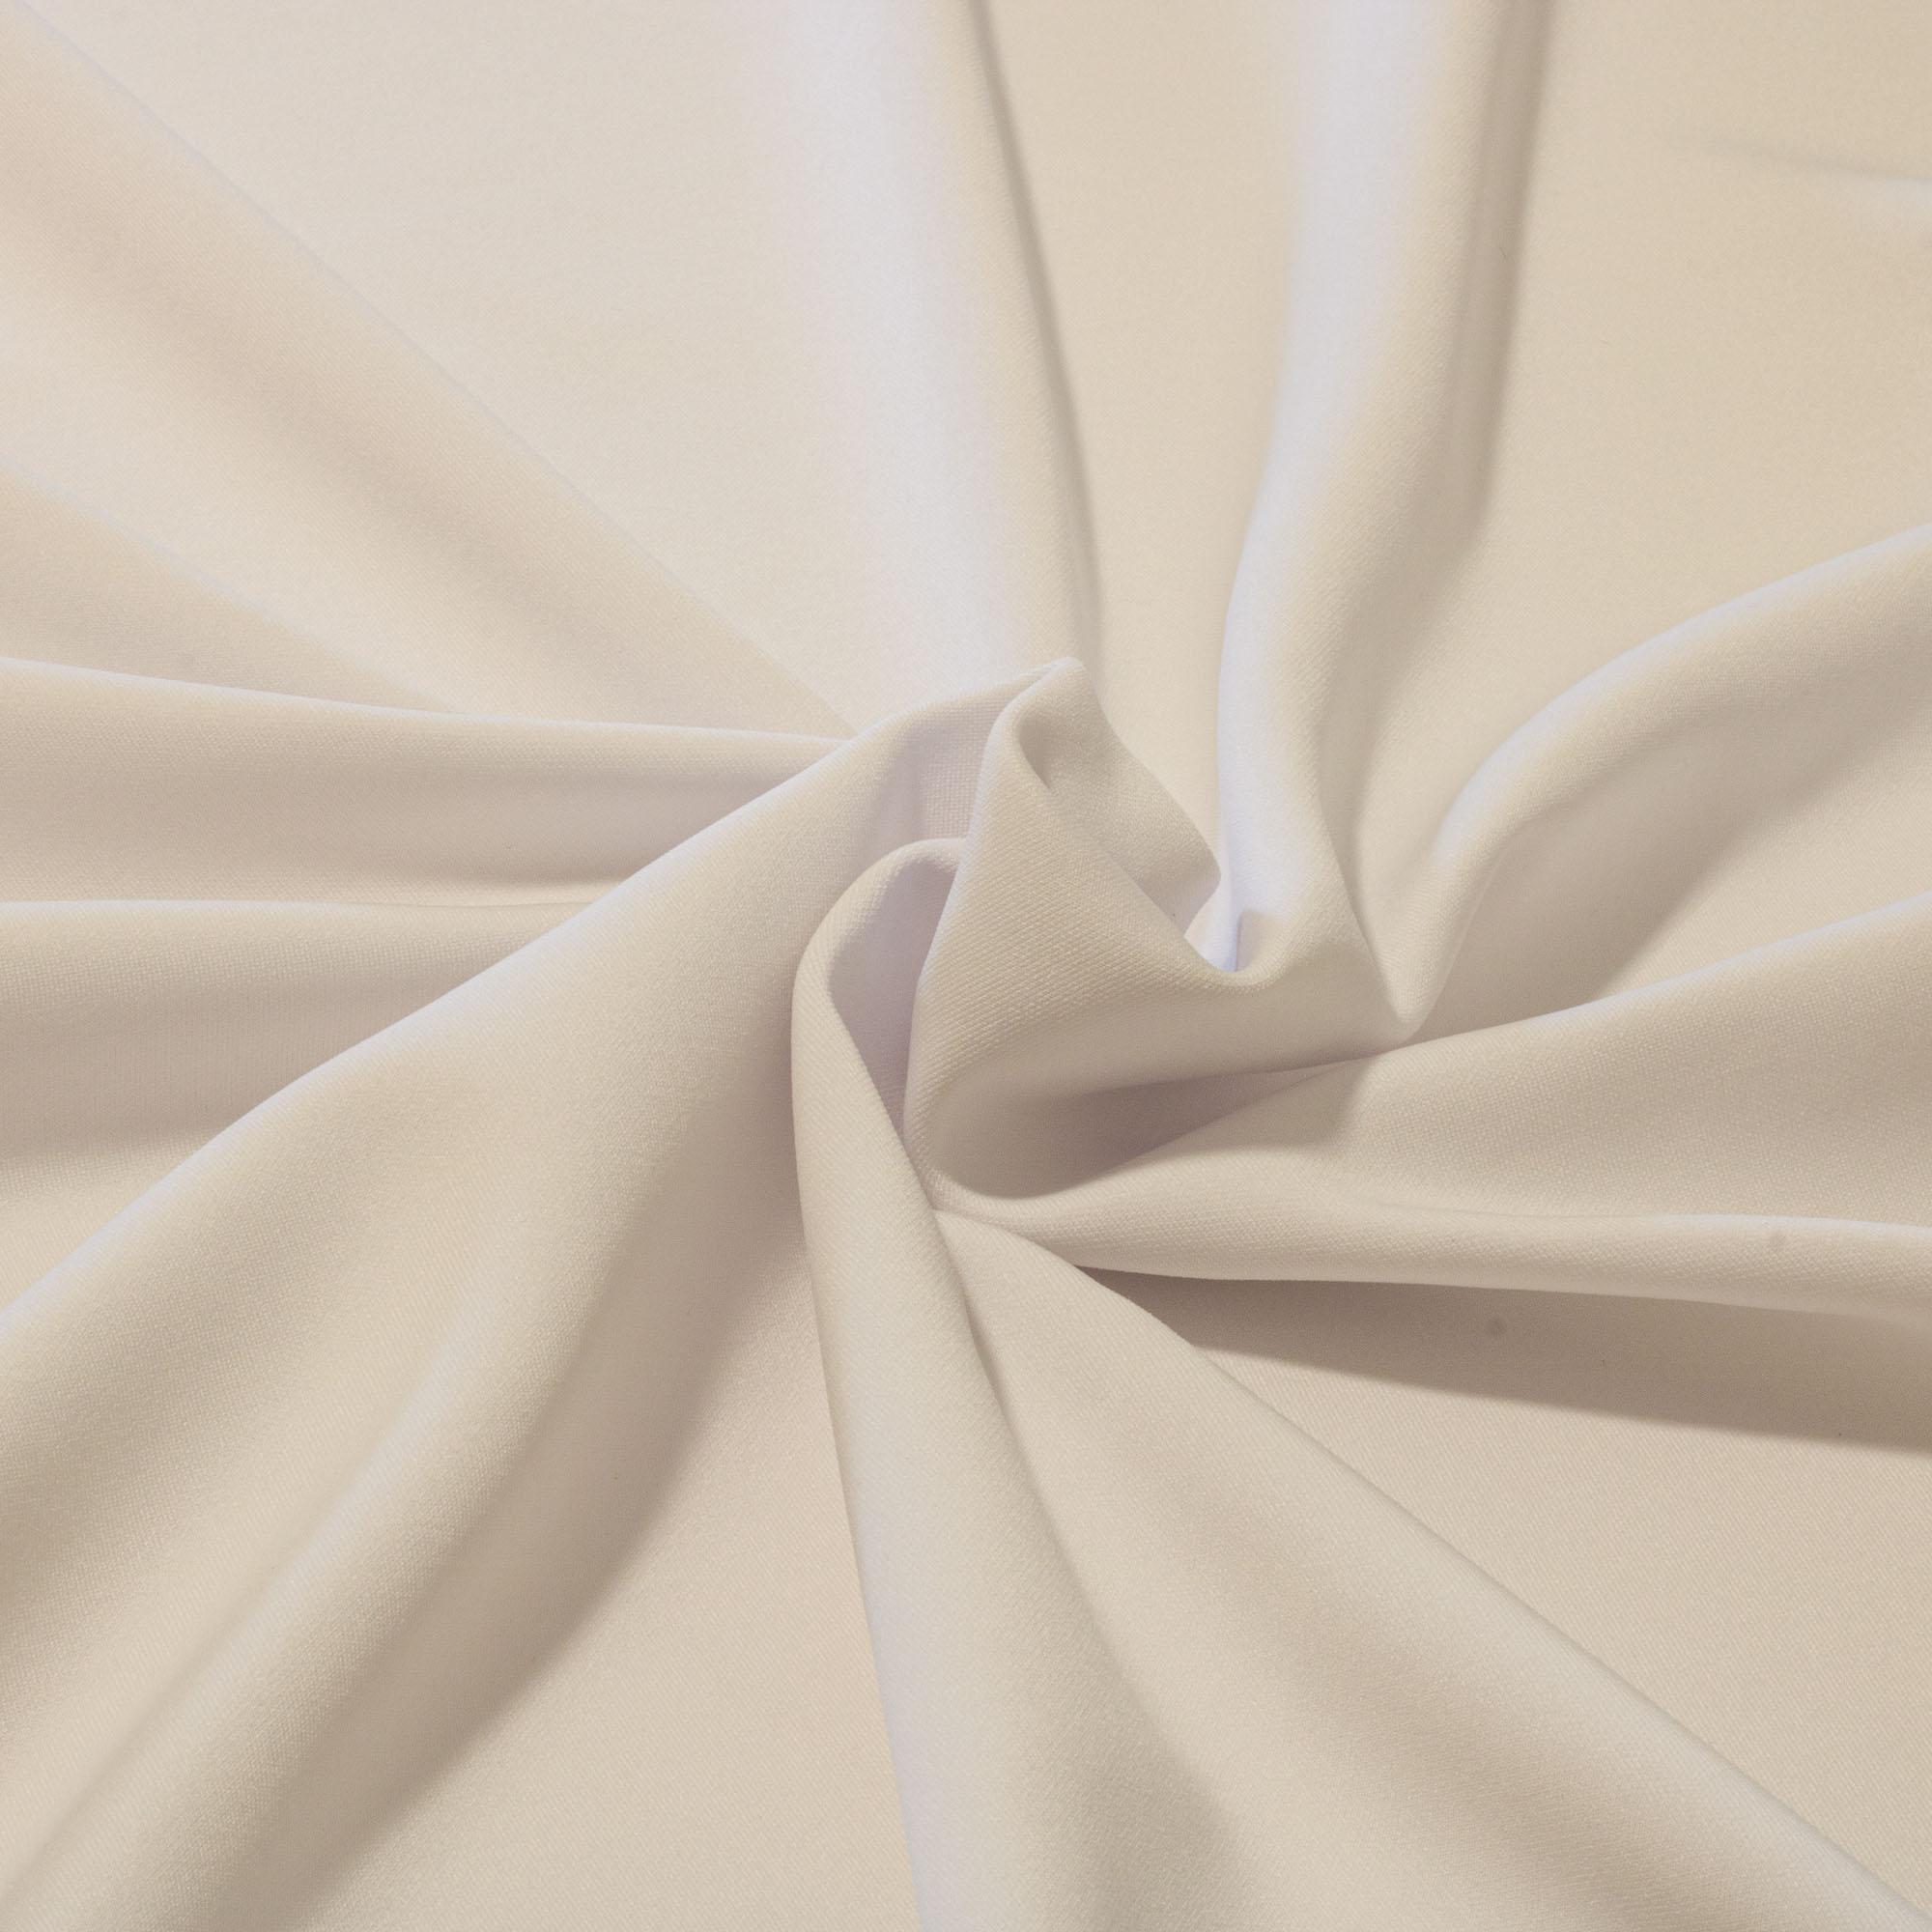 Tecido Malha Neoprene Liso 93% Poliéster 7% Elastano  Branco